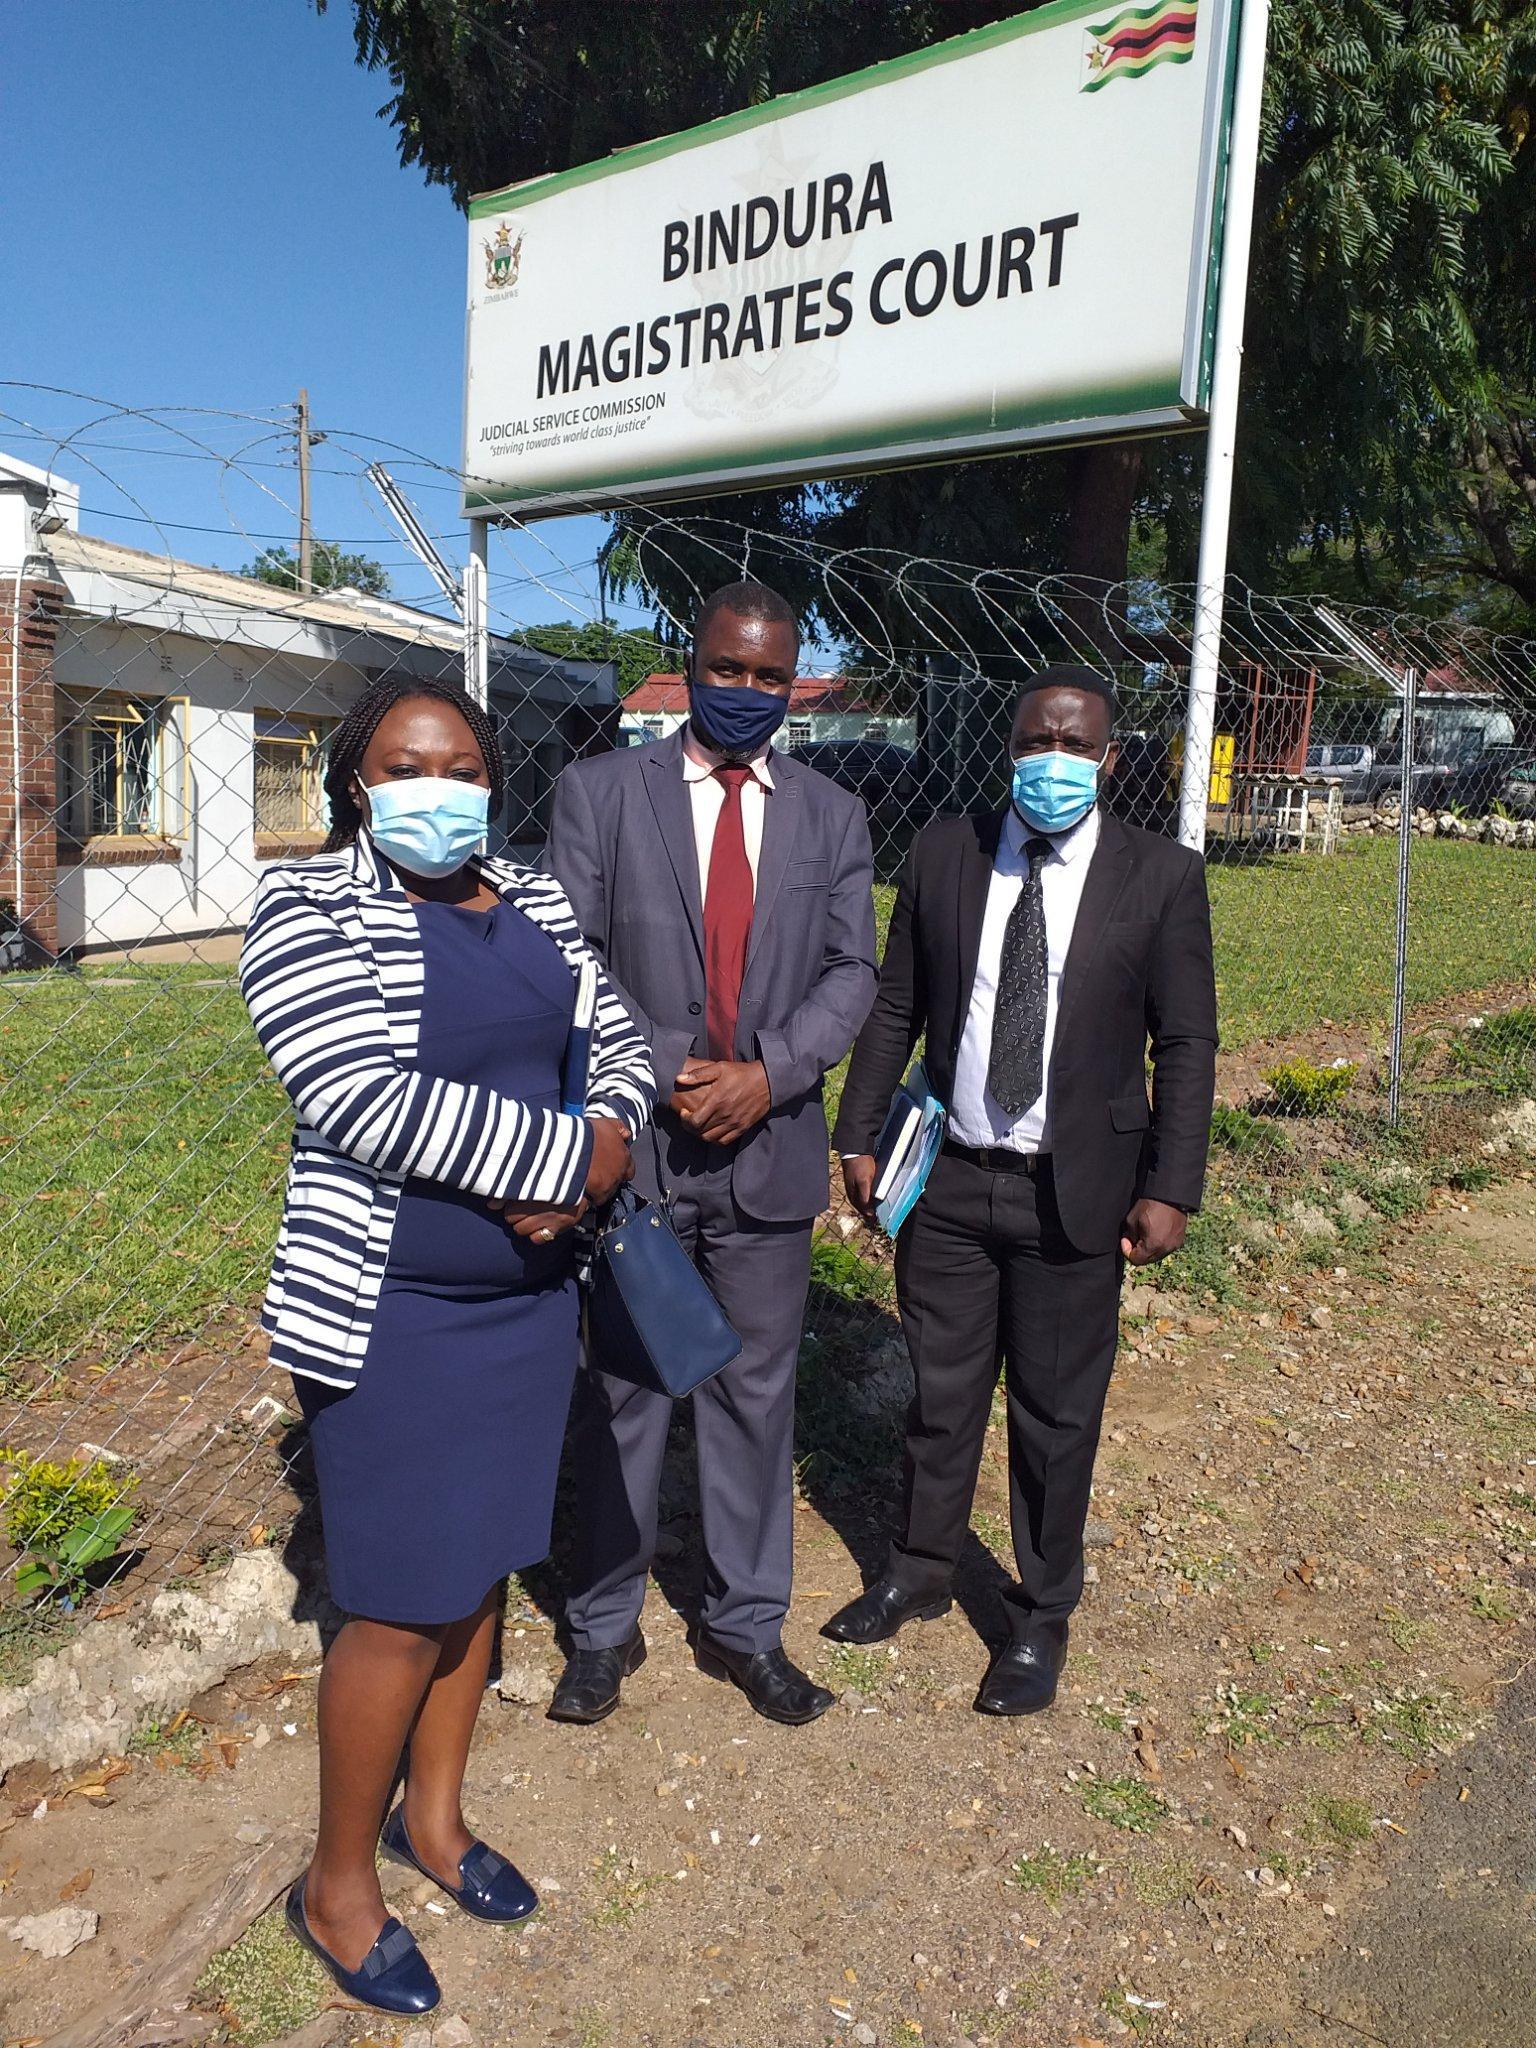 ZANU PF Official In Court For 'Undermining' Mnangagwa